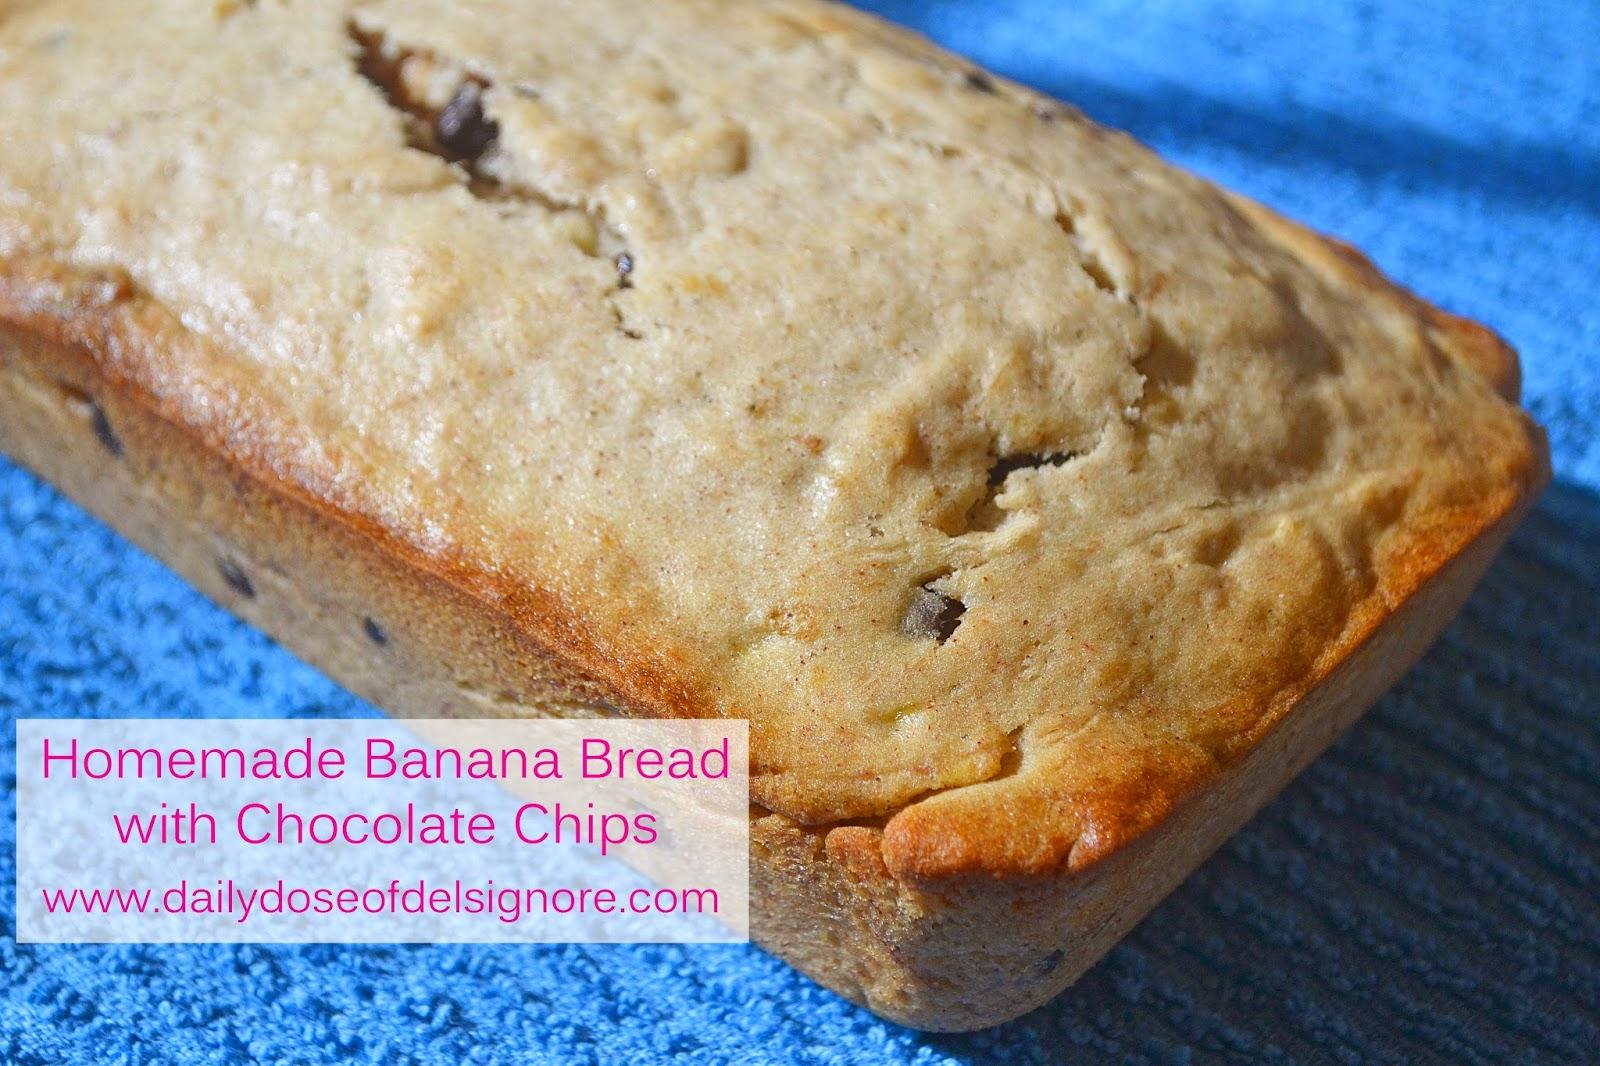 #bananabread #homemade #lowcalorie #healthy #recipe #IIFYM #macros